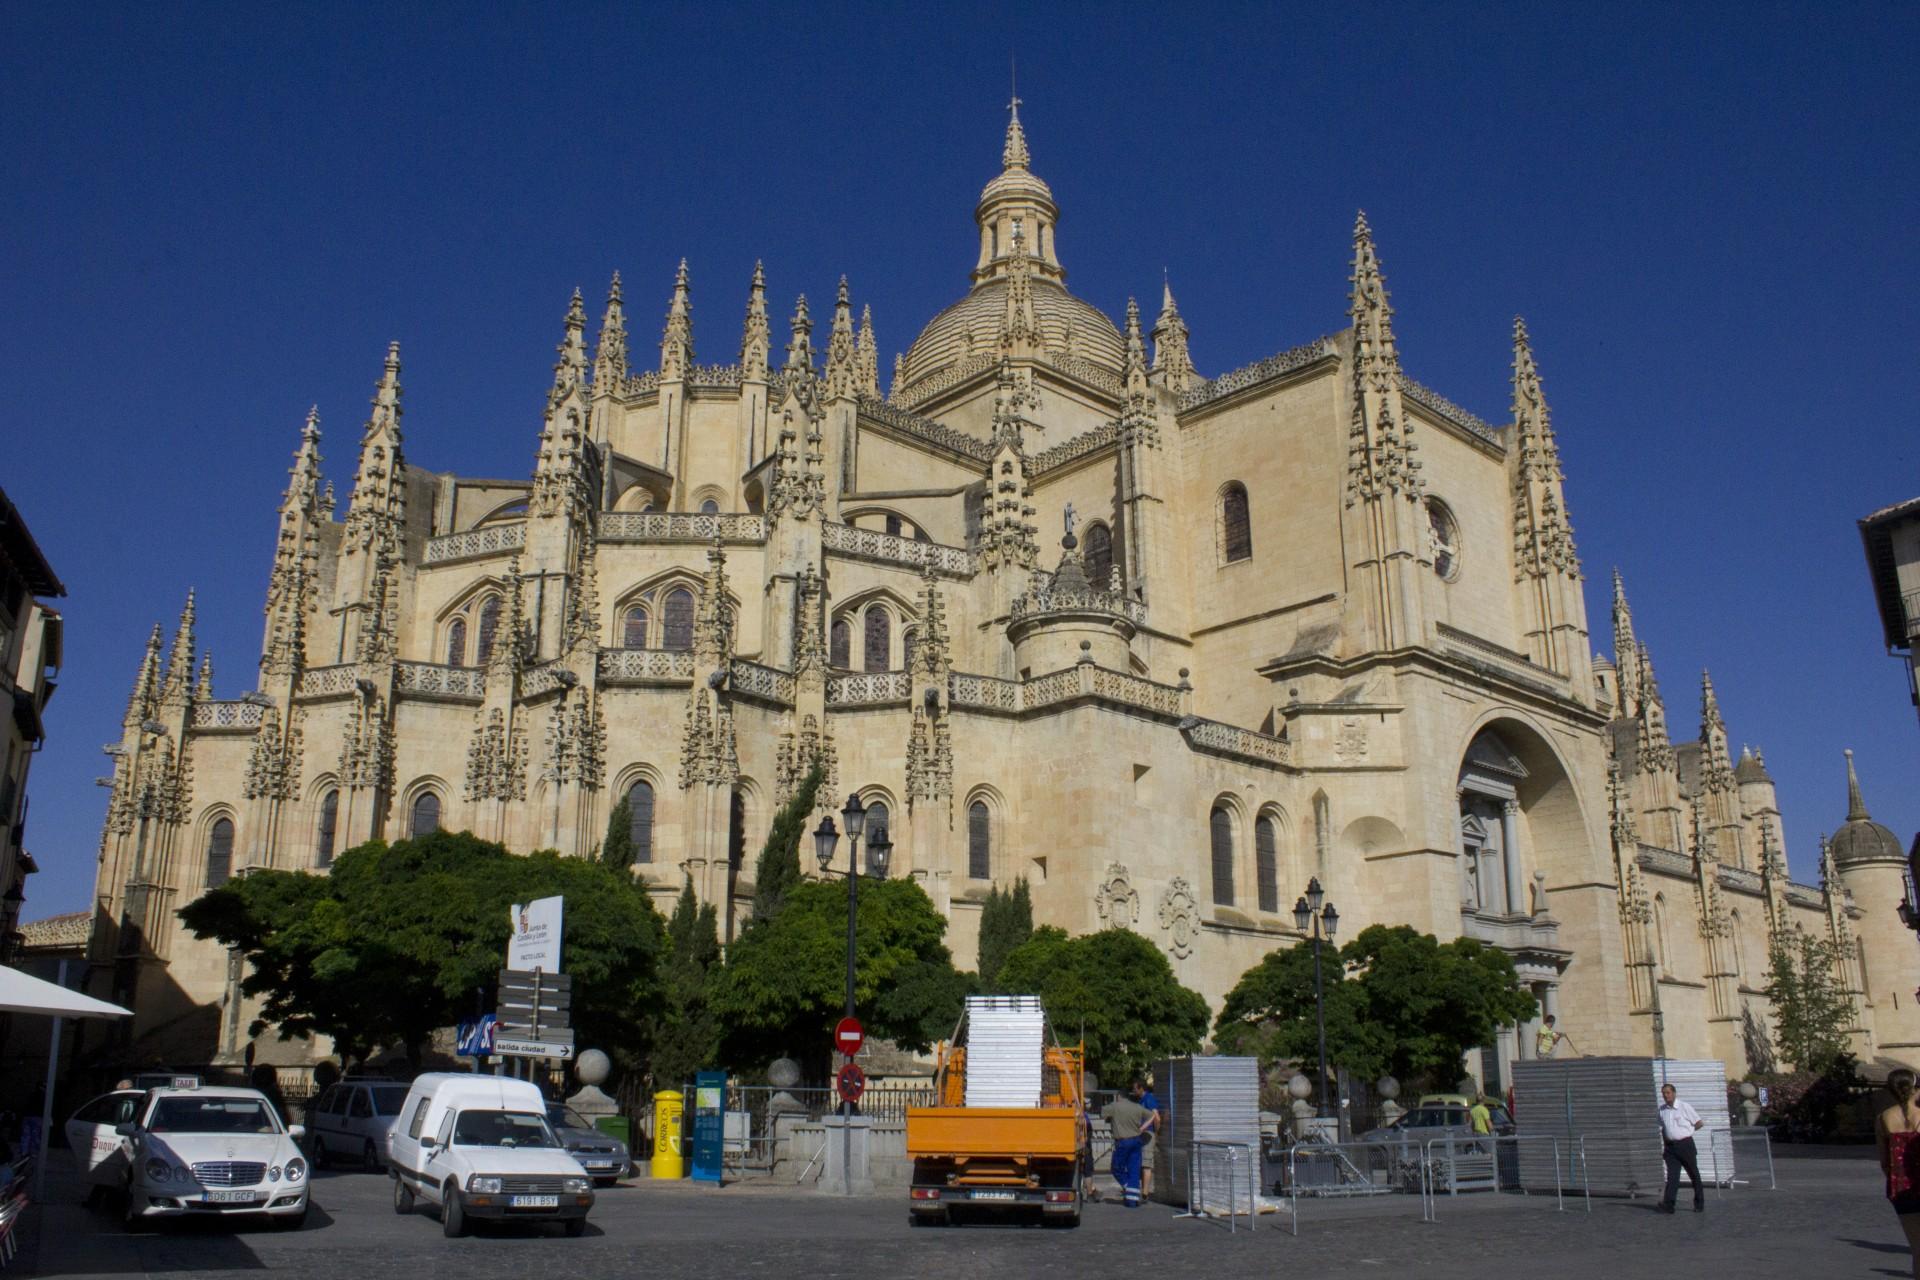 La Catedral de Segovia - Stephanie Elise PhotographyStephanie Elise Photography